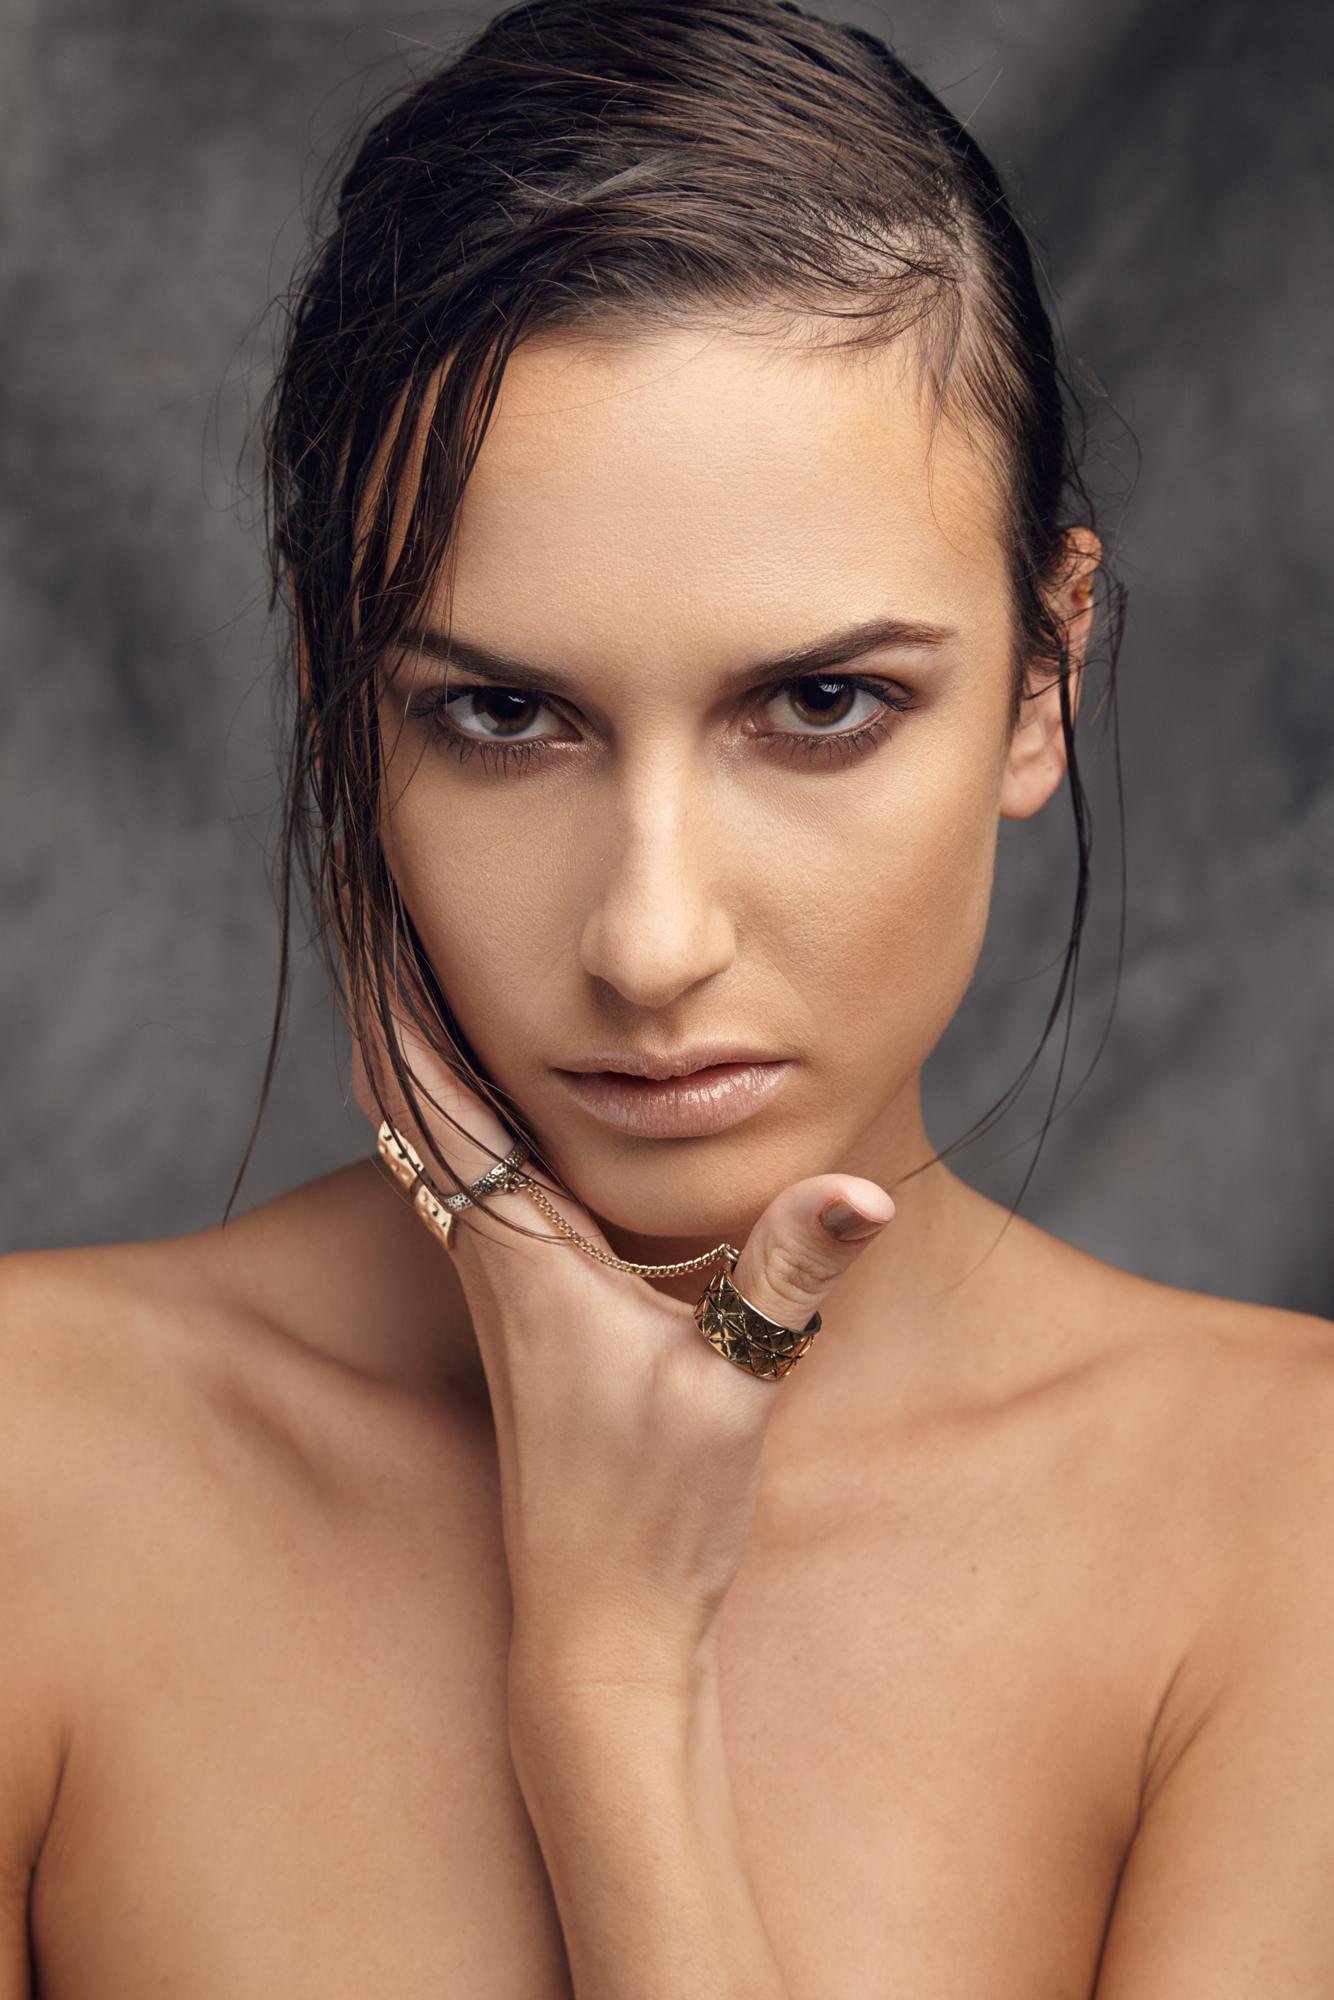 Michael Populus Photography Portraiture Photographer Megan Muhhoberac